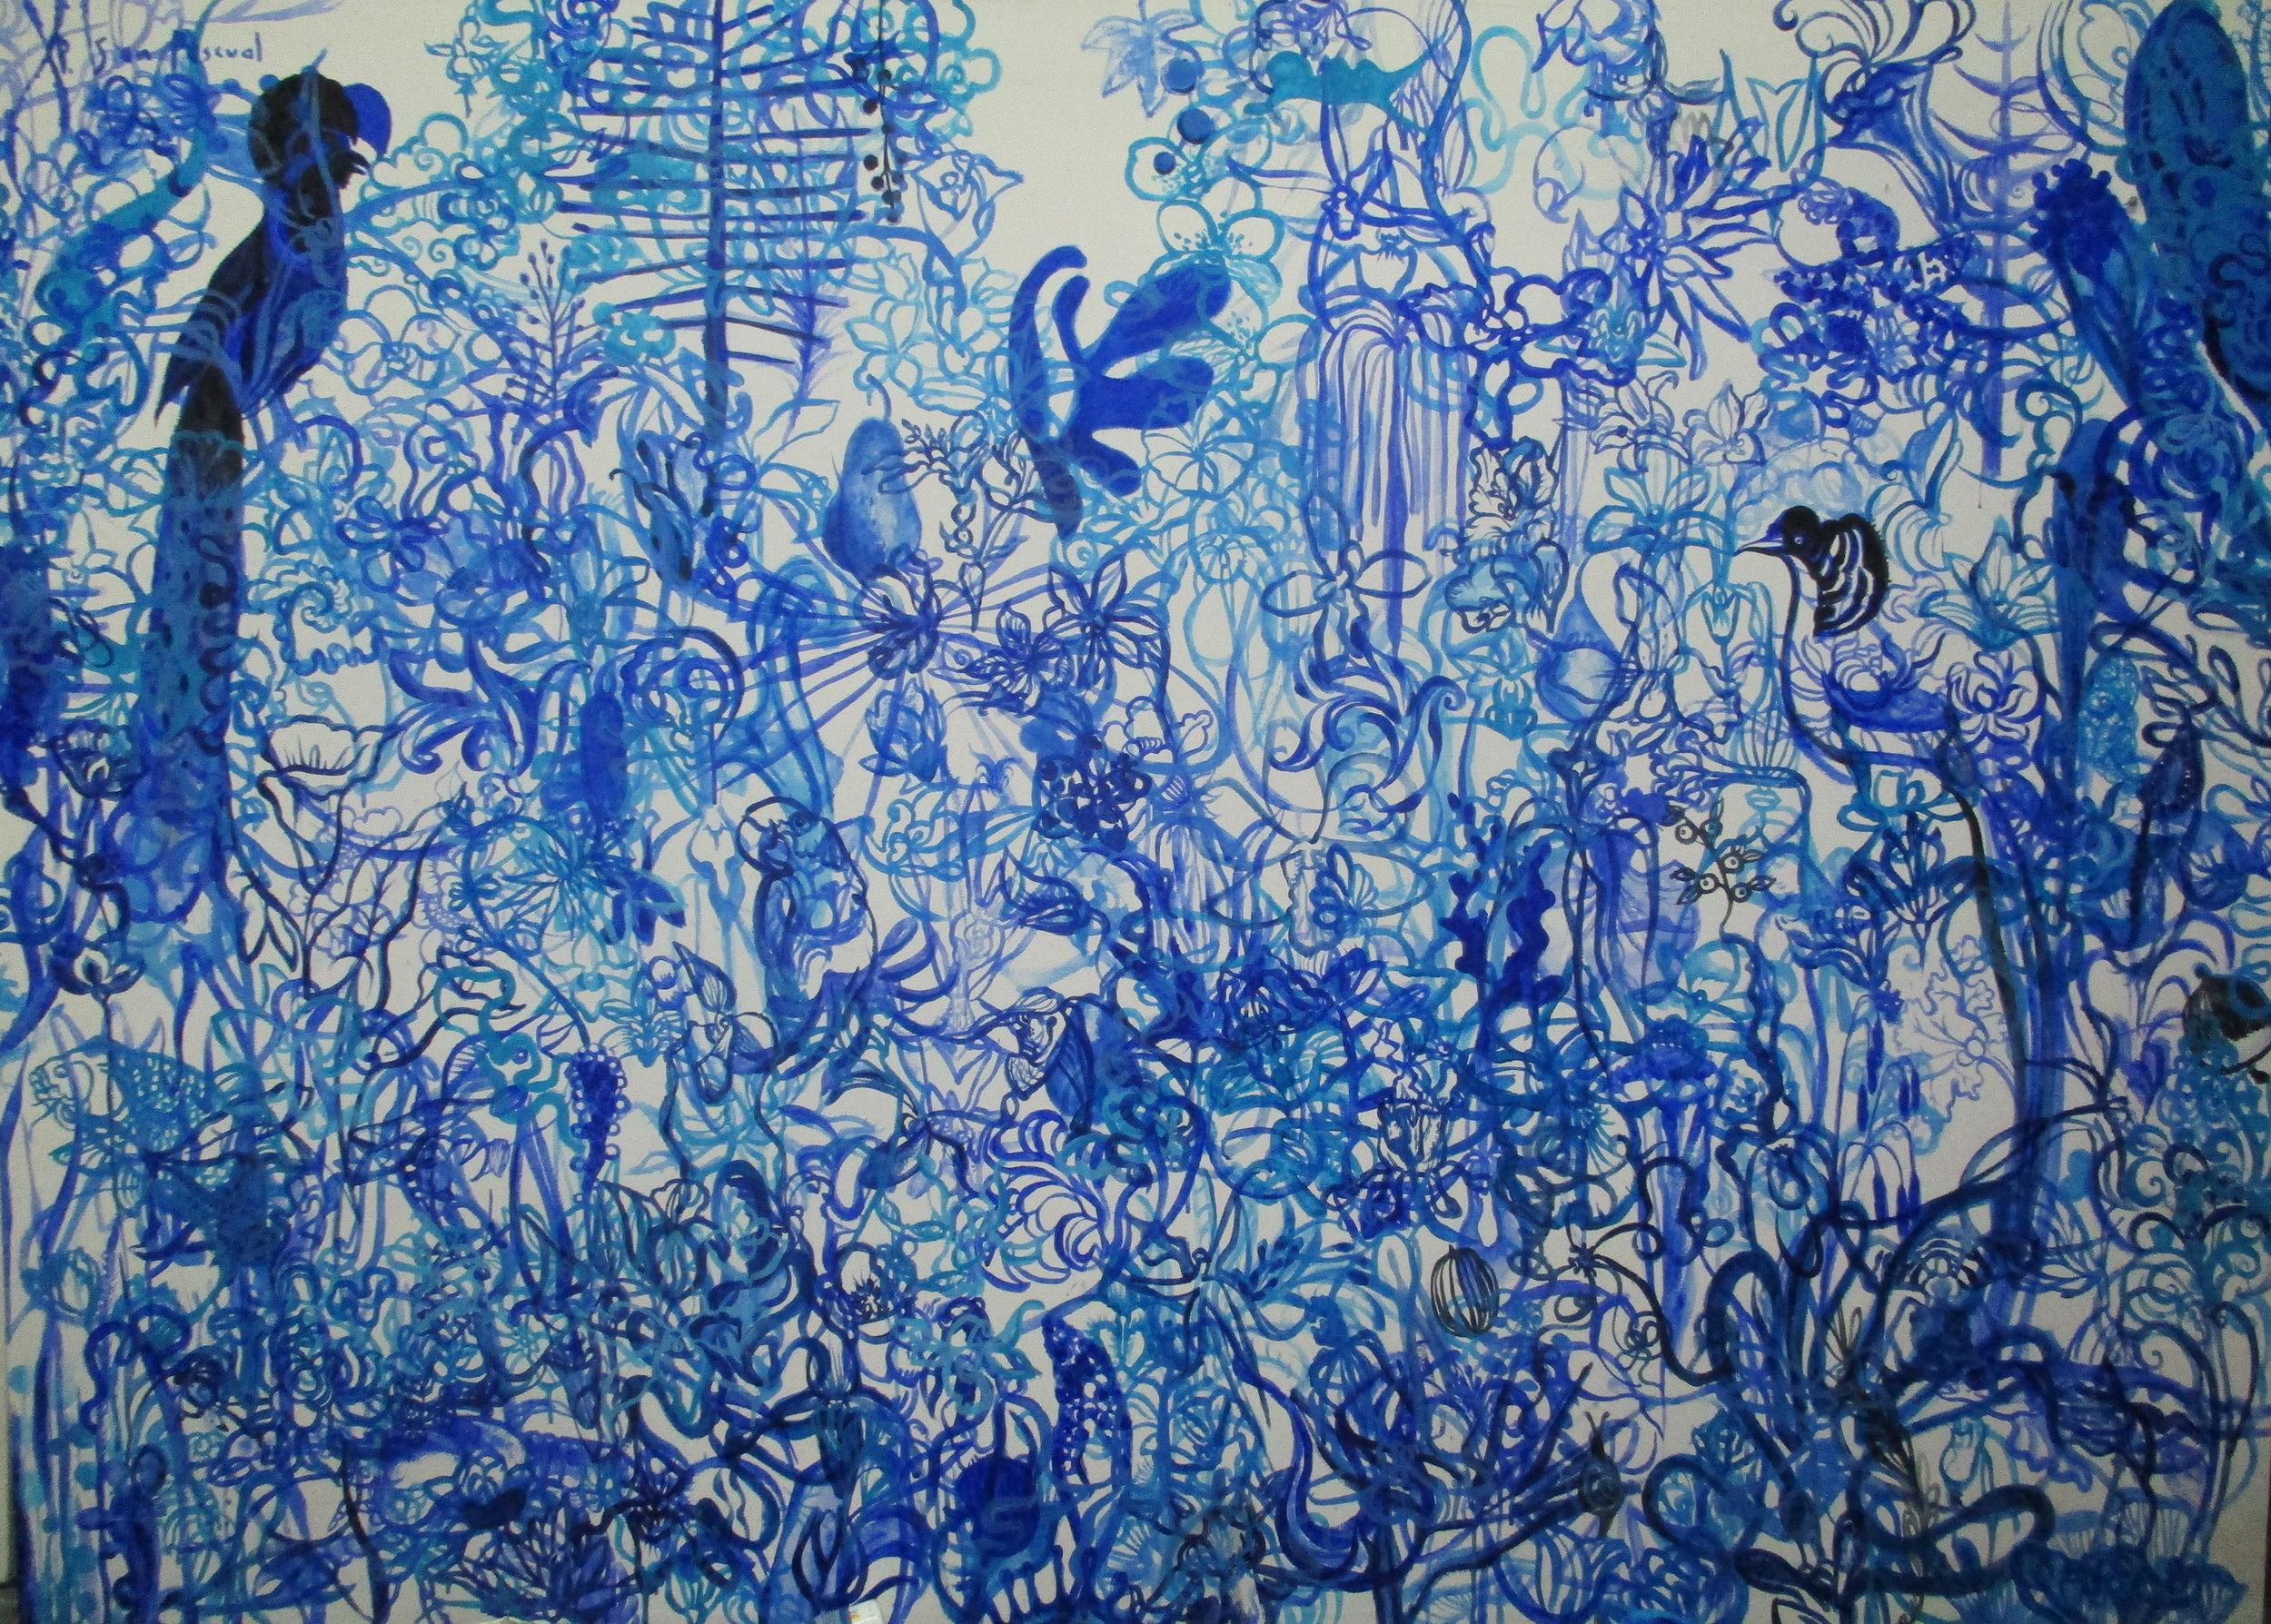 Botanica with Bird of Paradise_75x55in_2016_MelindaGarcia.JPG